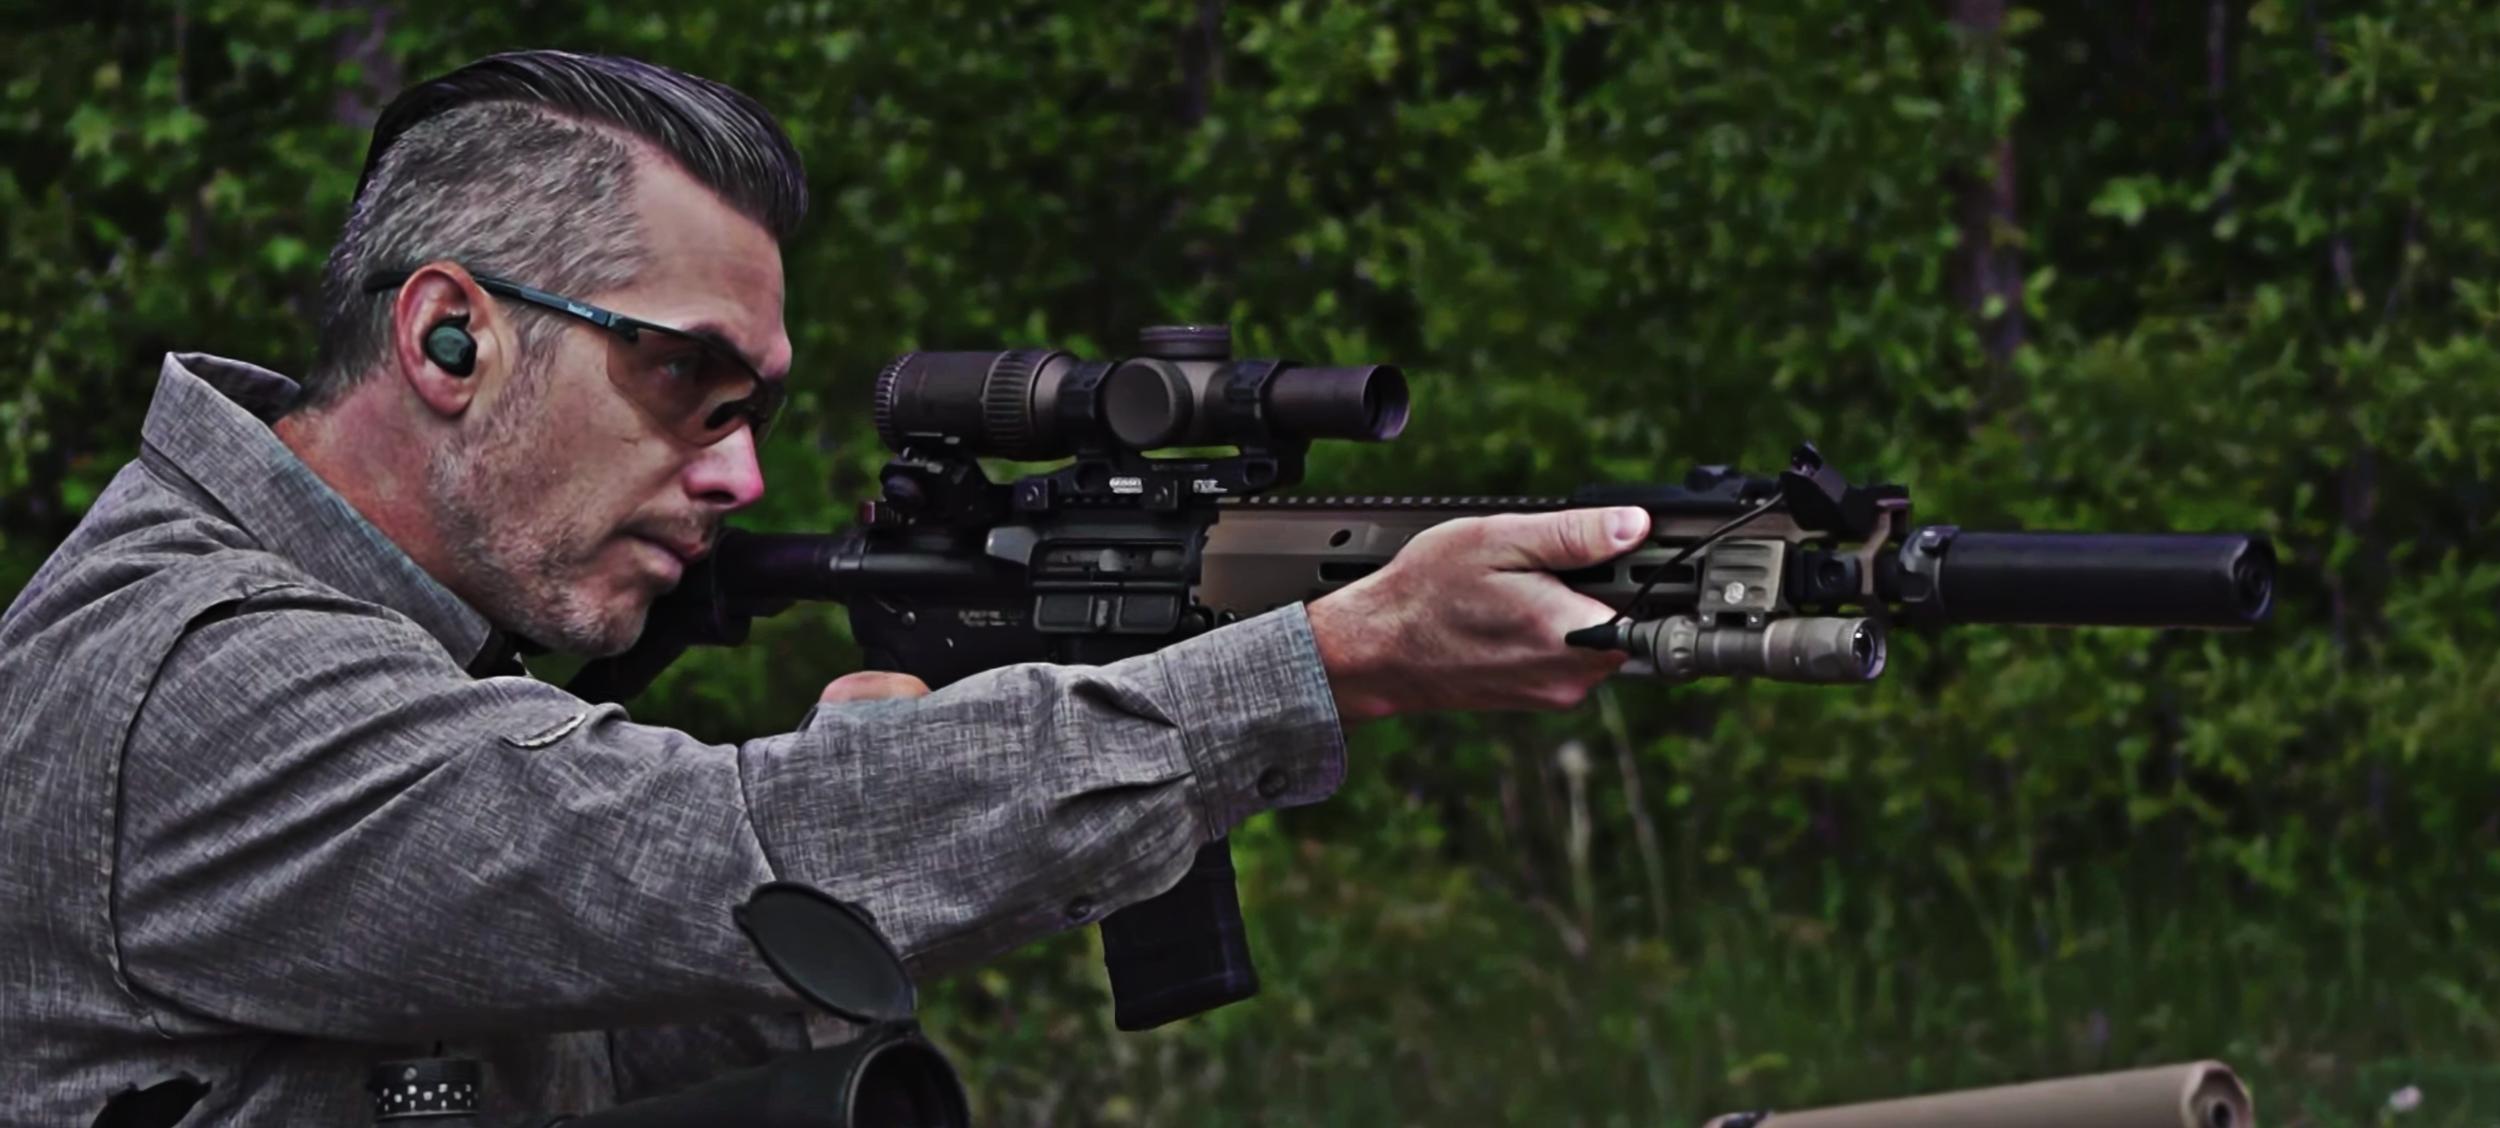 SureFire Flashlights, WeaponLights, Suppressors on Guns & Gear